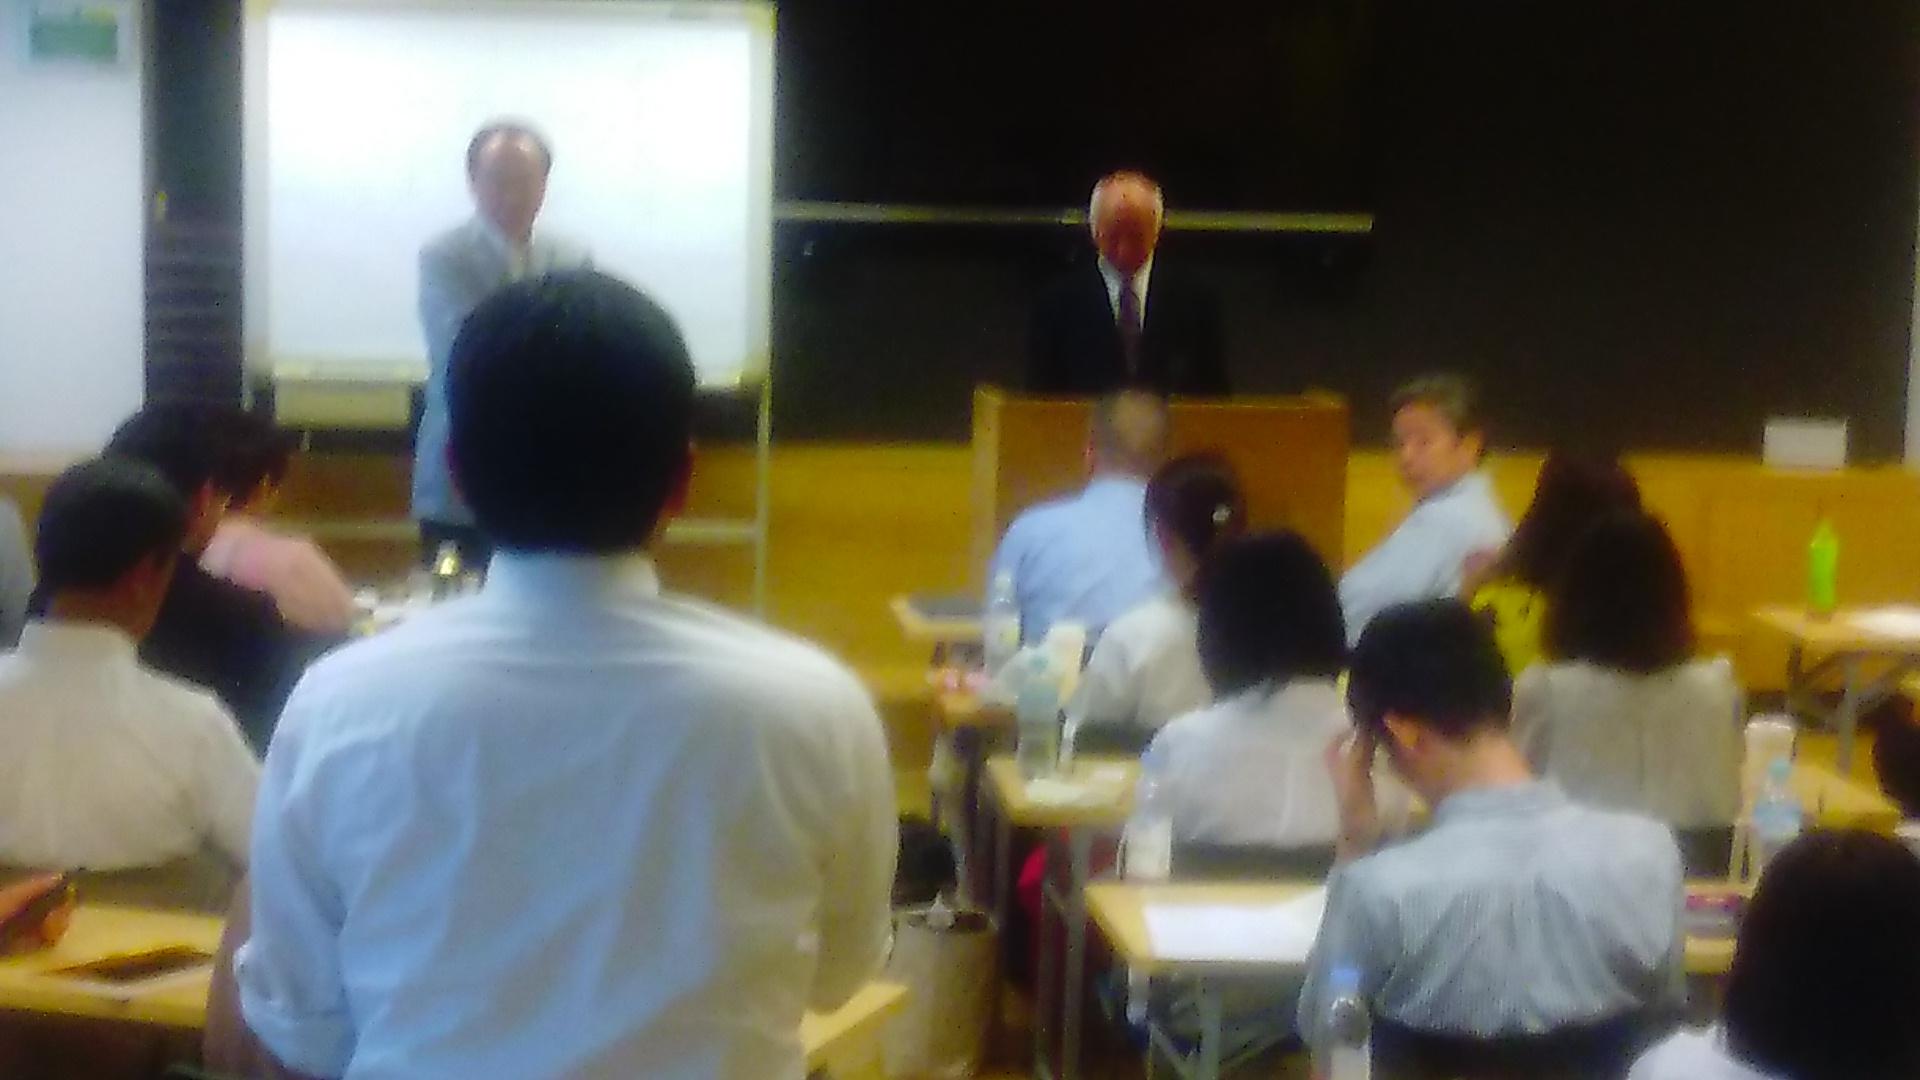 KIMG0756 - 思風会全国大会in広島